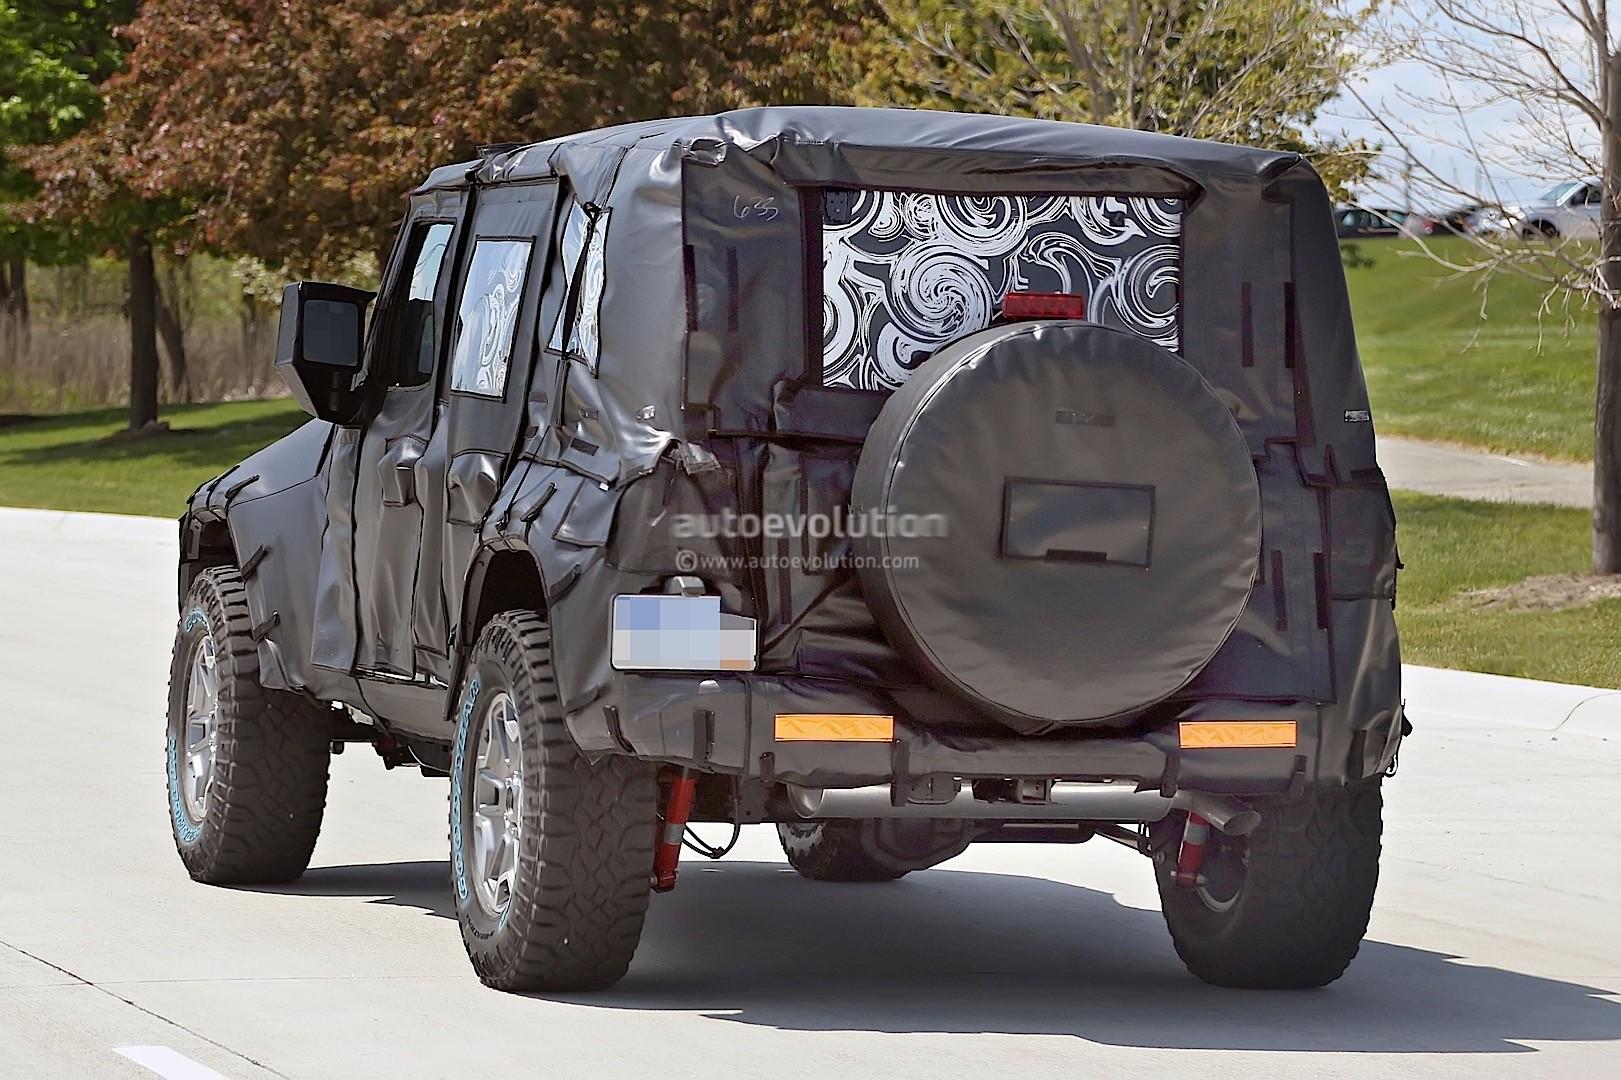 fca 39 s mild hybrid plans for jeep and ram brands could. Black Bedroom Furniture Sets. Home Design Ideas